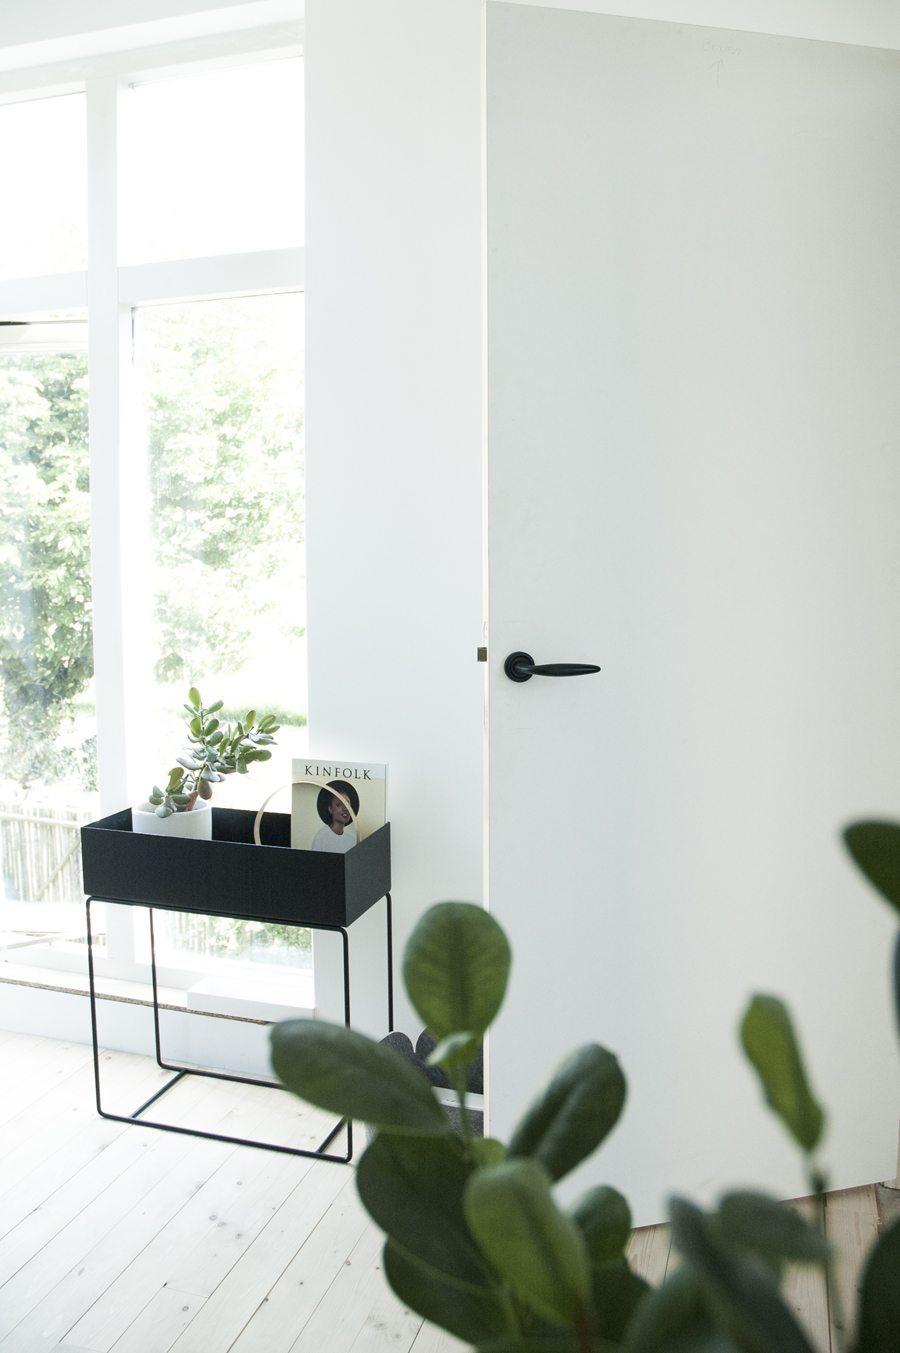 ferm-living-plantenbak-zwart-bij-raam